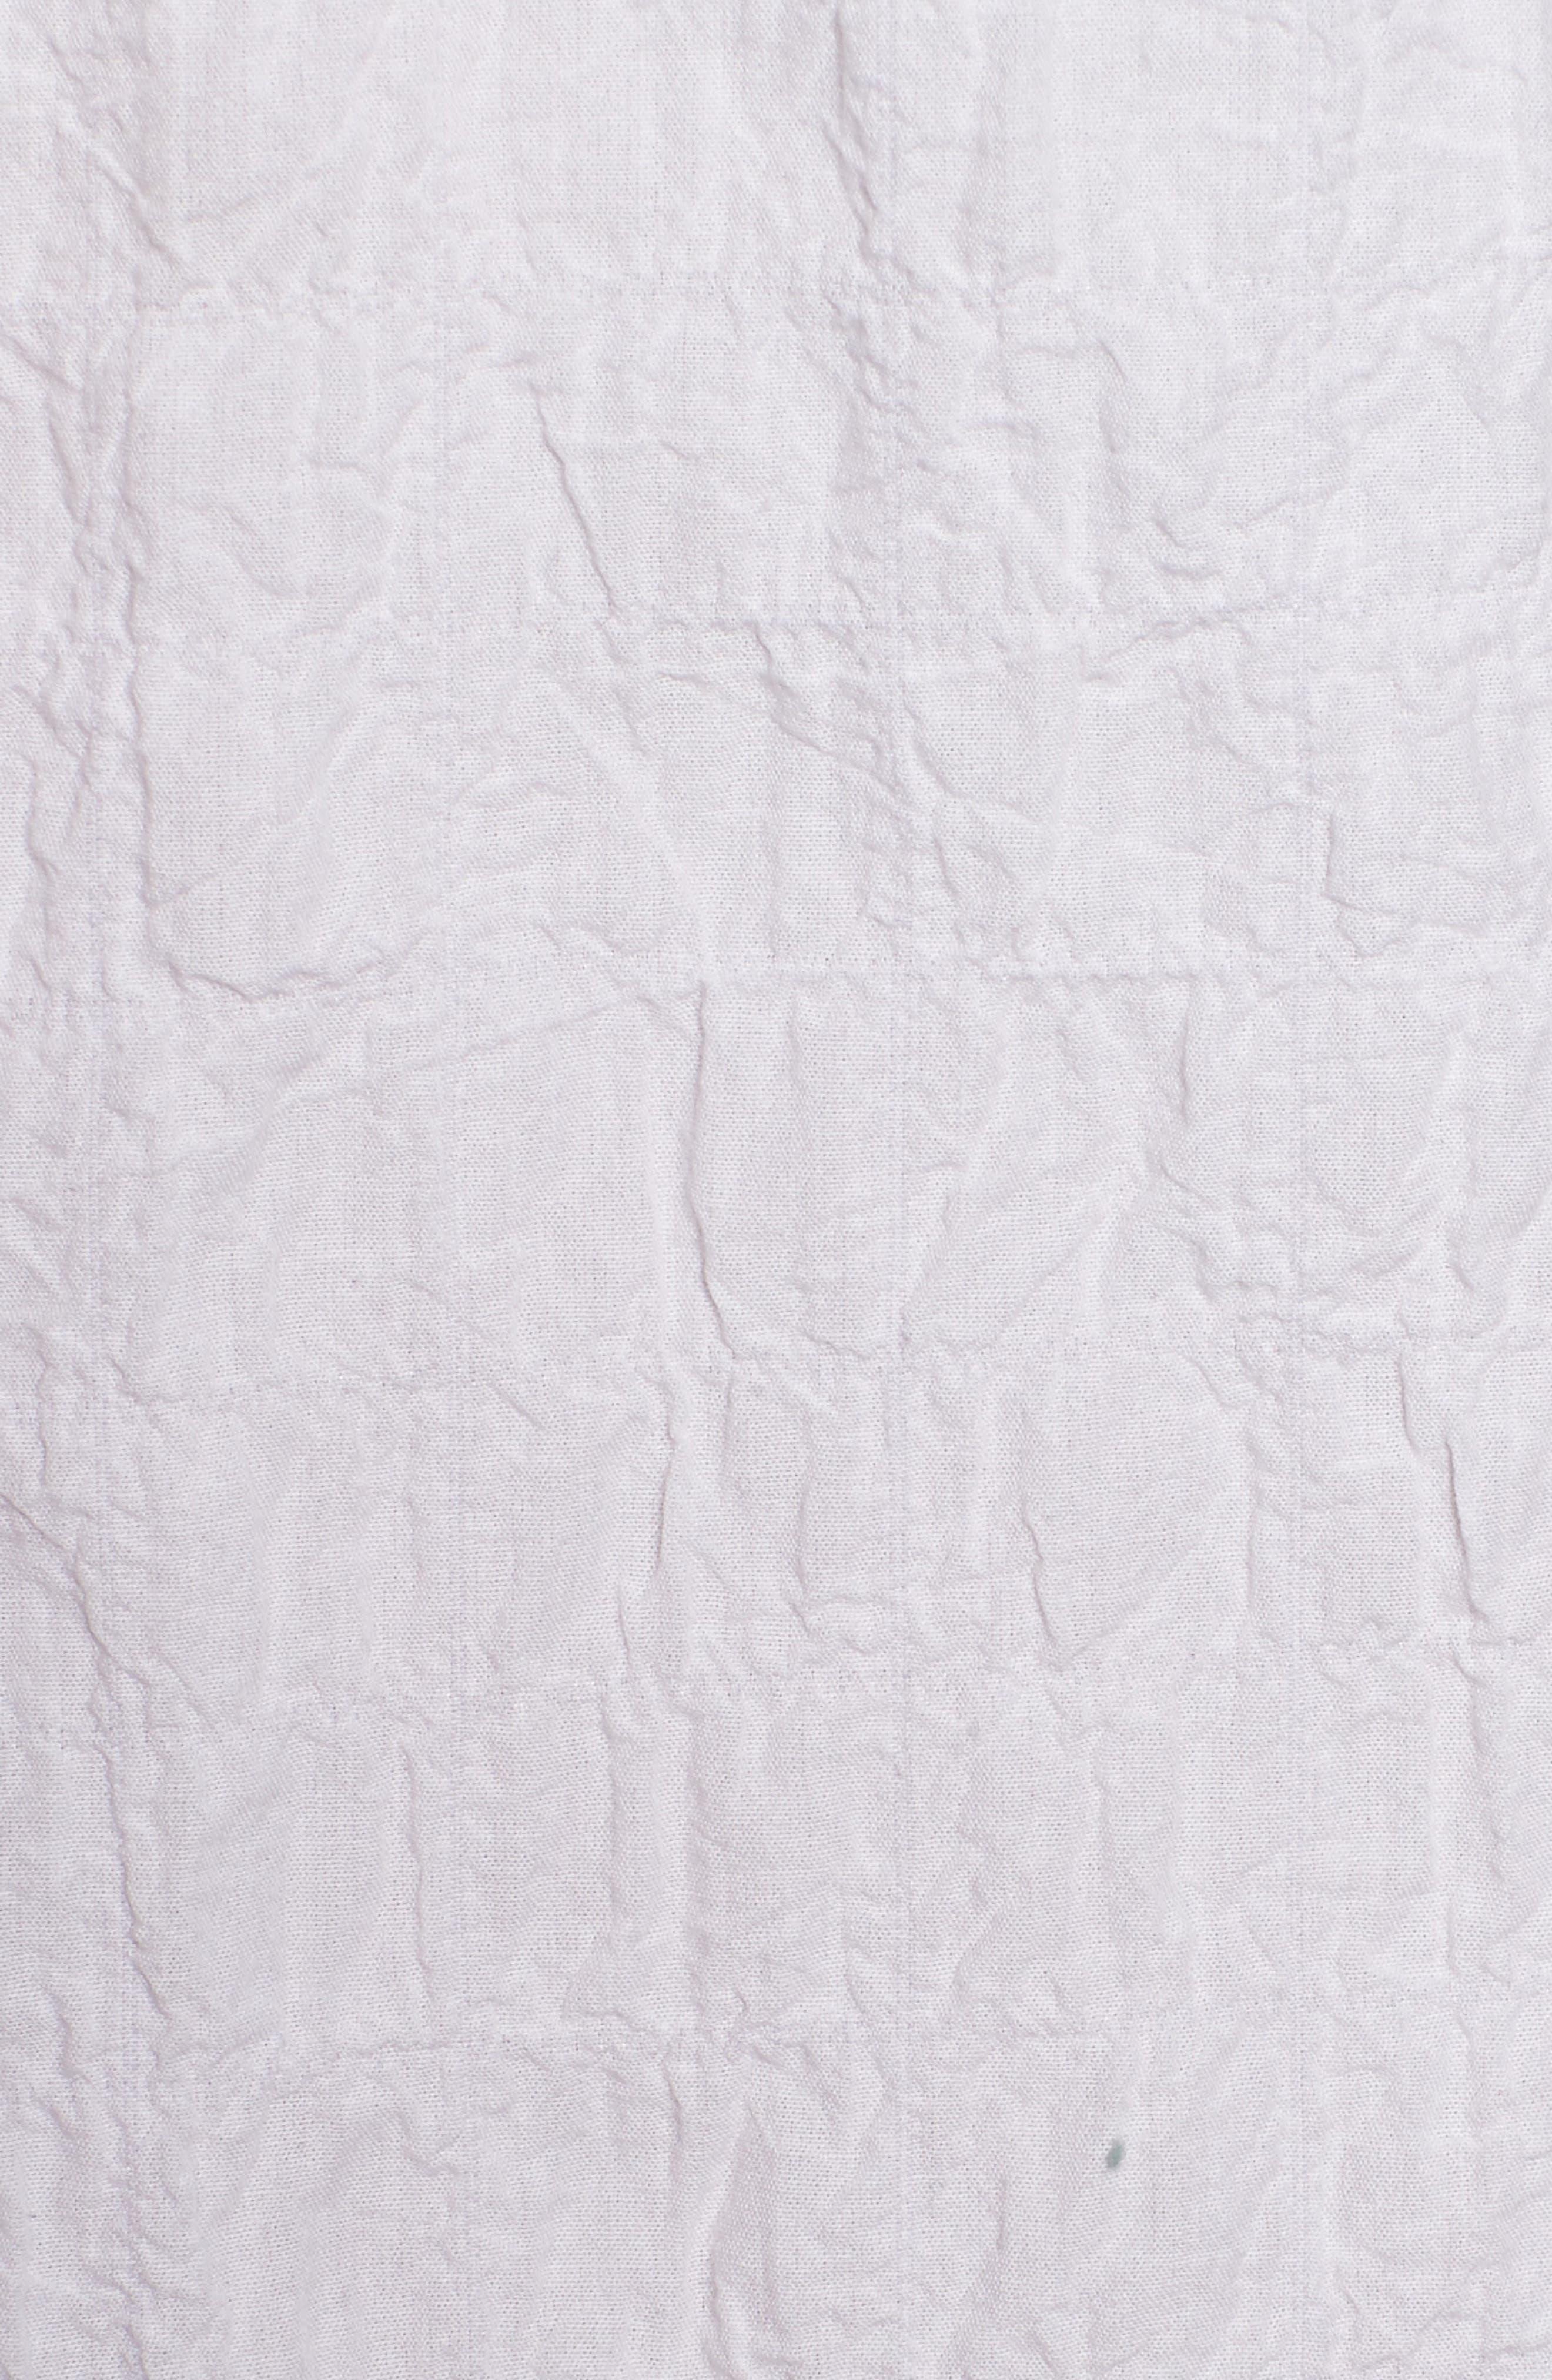 Button Up Shirt,                             Alternate thumbnail 5, color,                             White